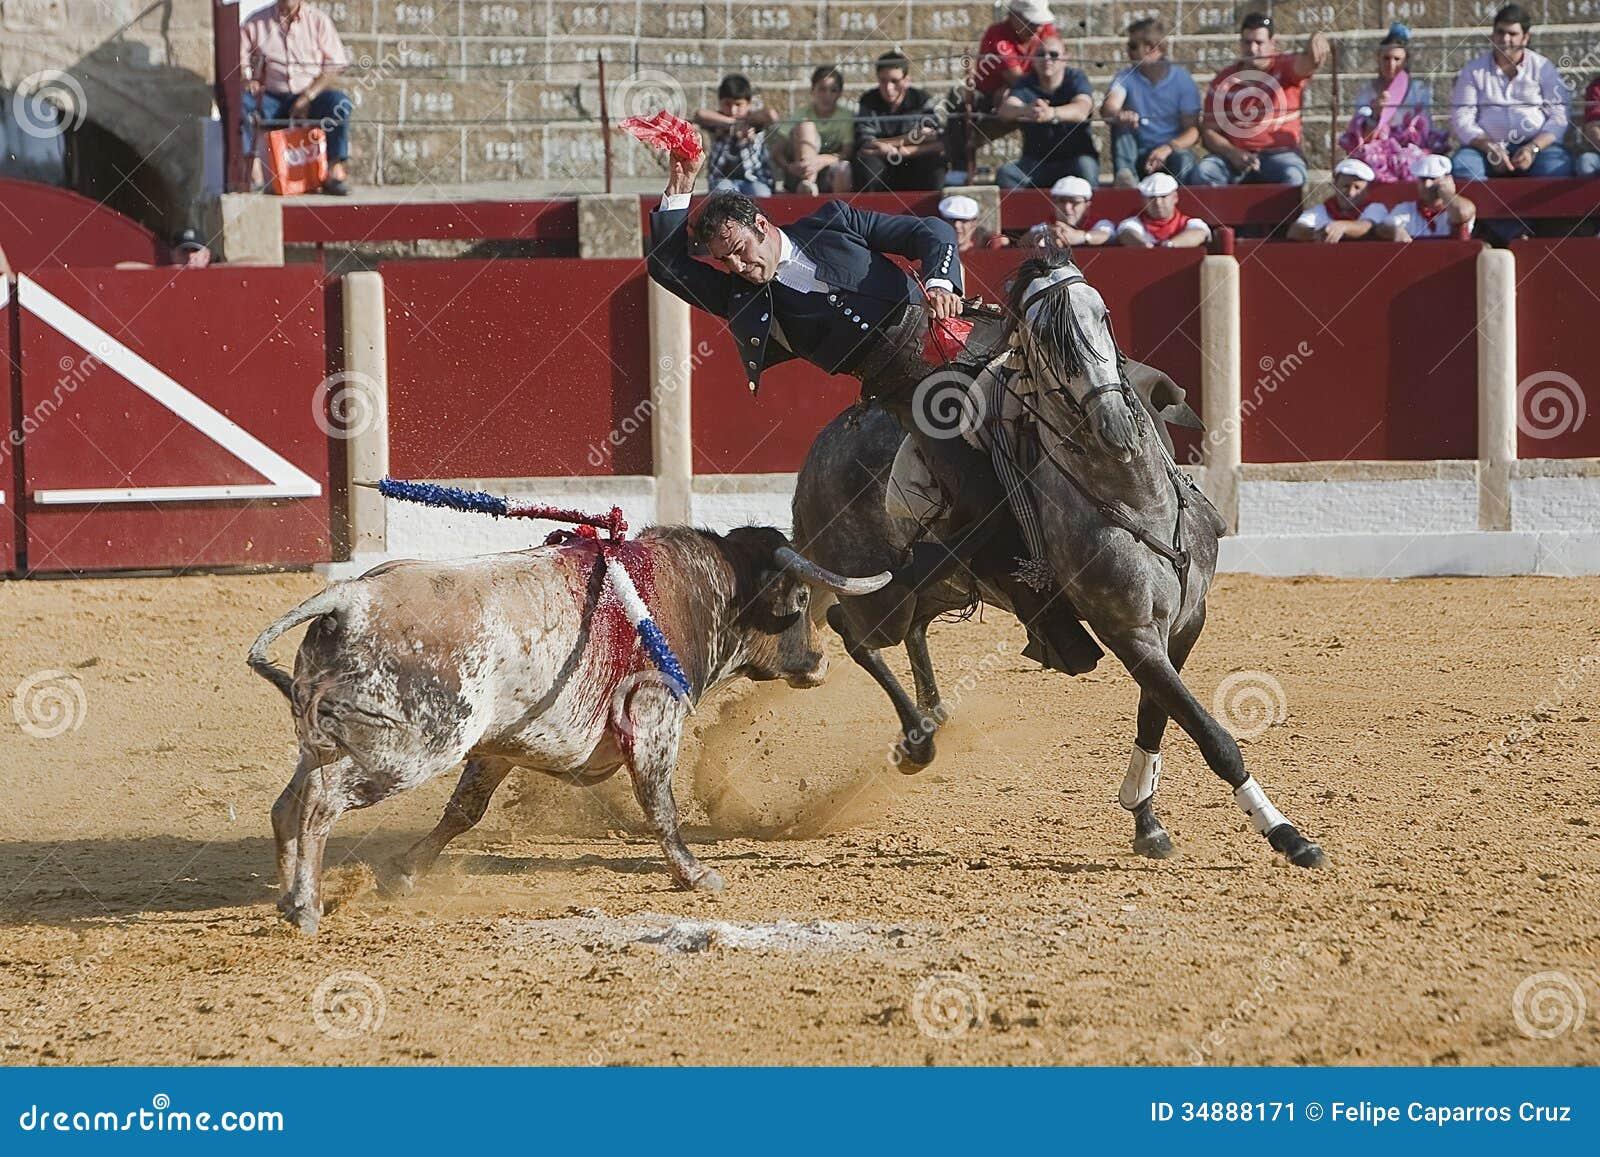 Alvaro Montes, bullfighter on horseback spanish